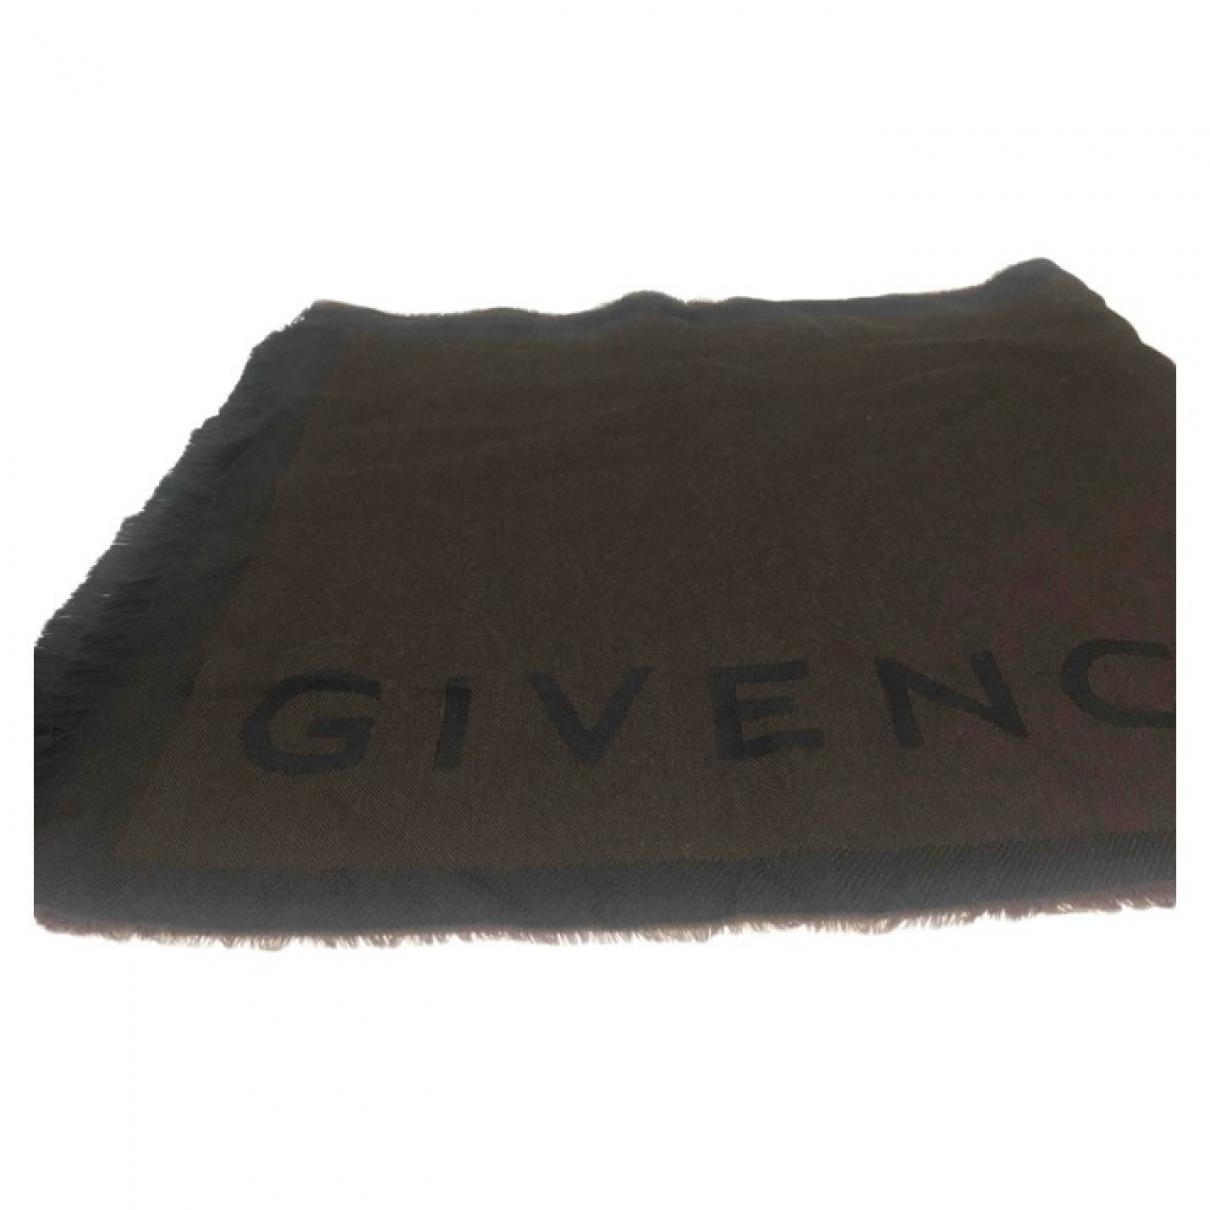 Givenchy \N Brown Wool scarf & pocket squares for Men \N